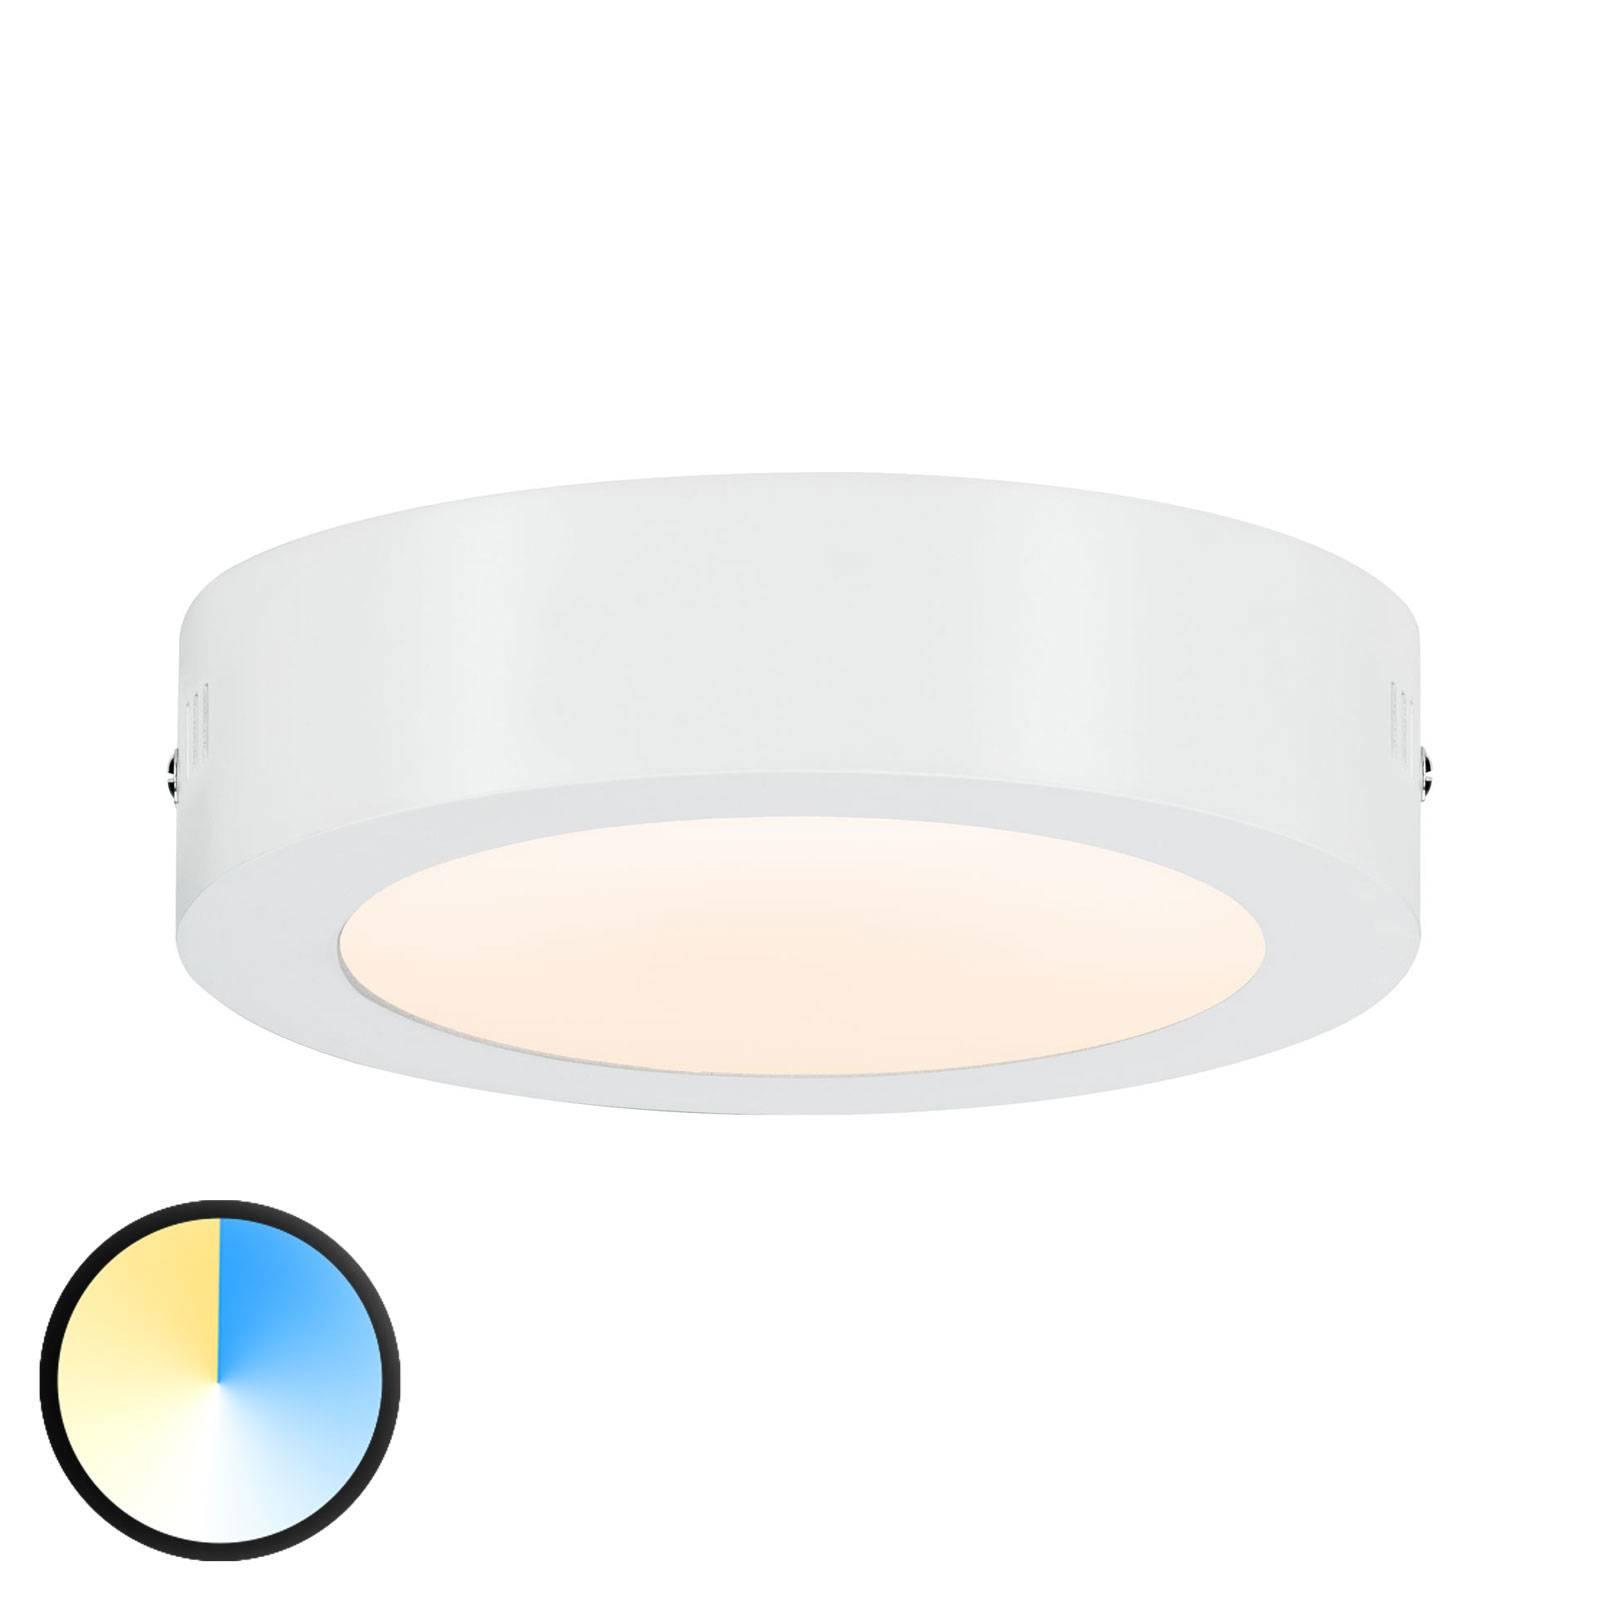 Paulmann Carpo LED plafondlamp rond wit 17cm